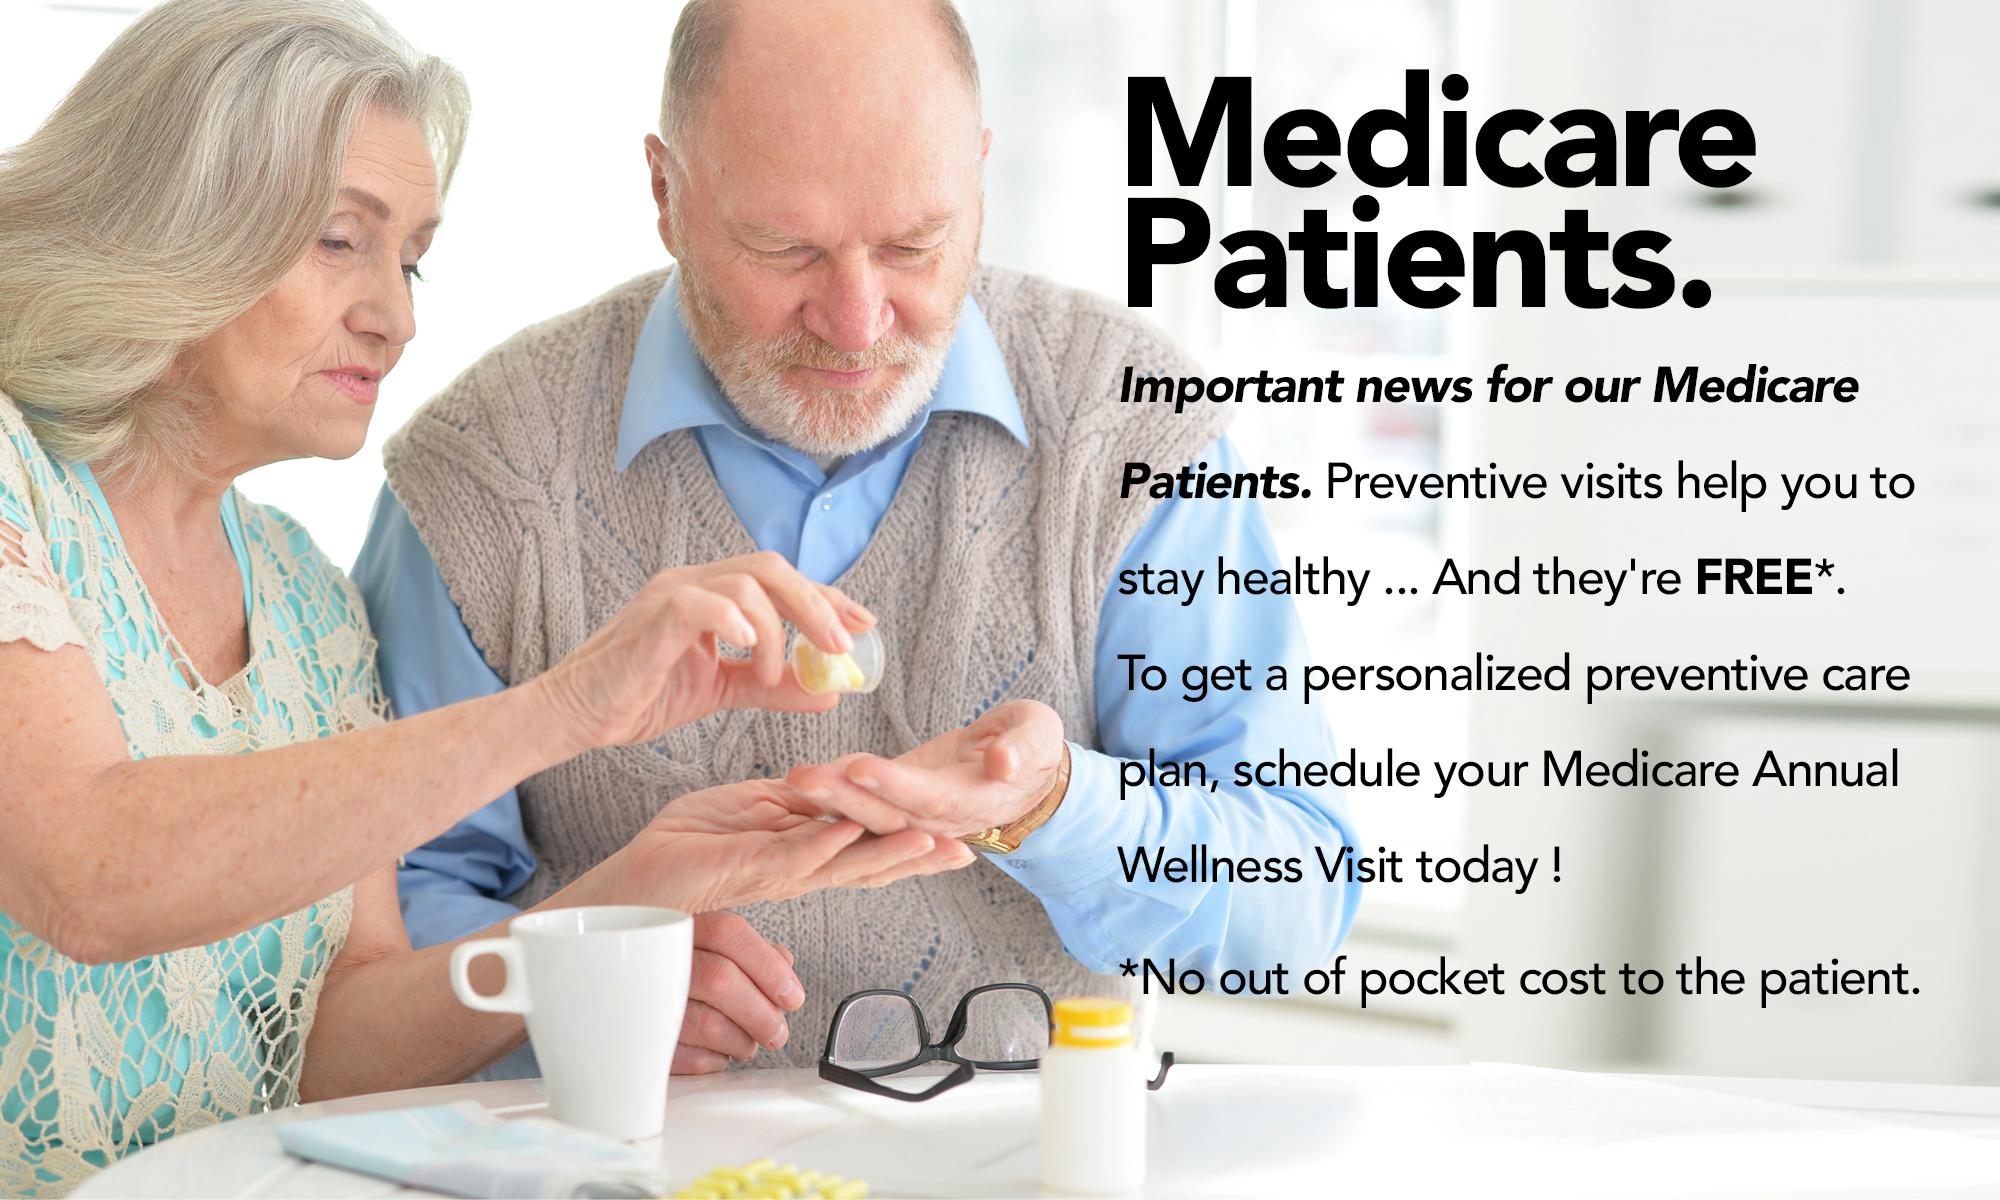 Medicare Patients